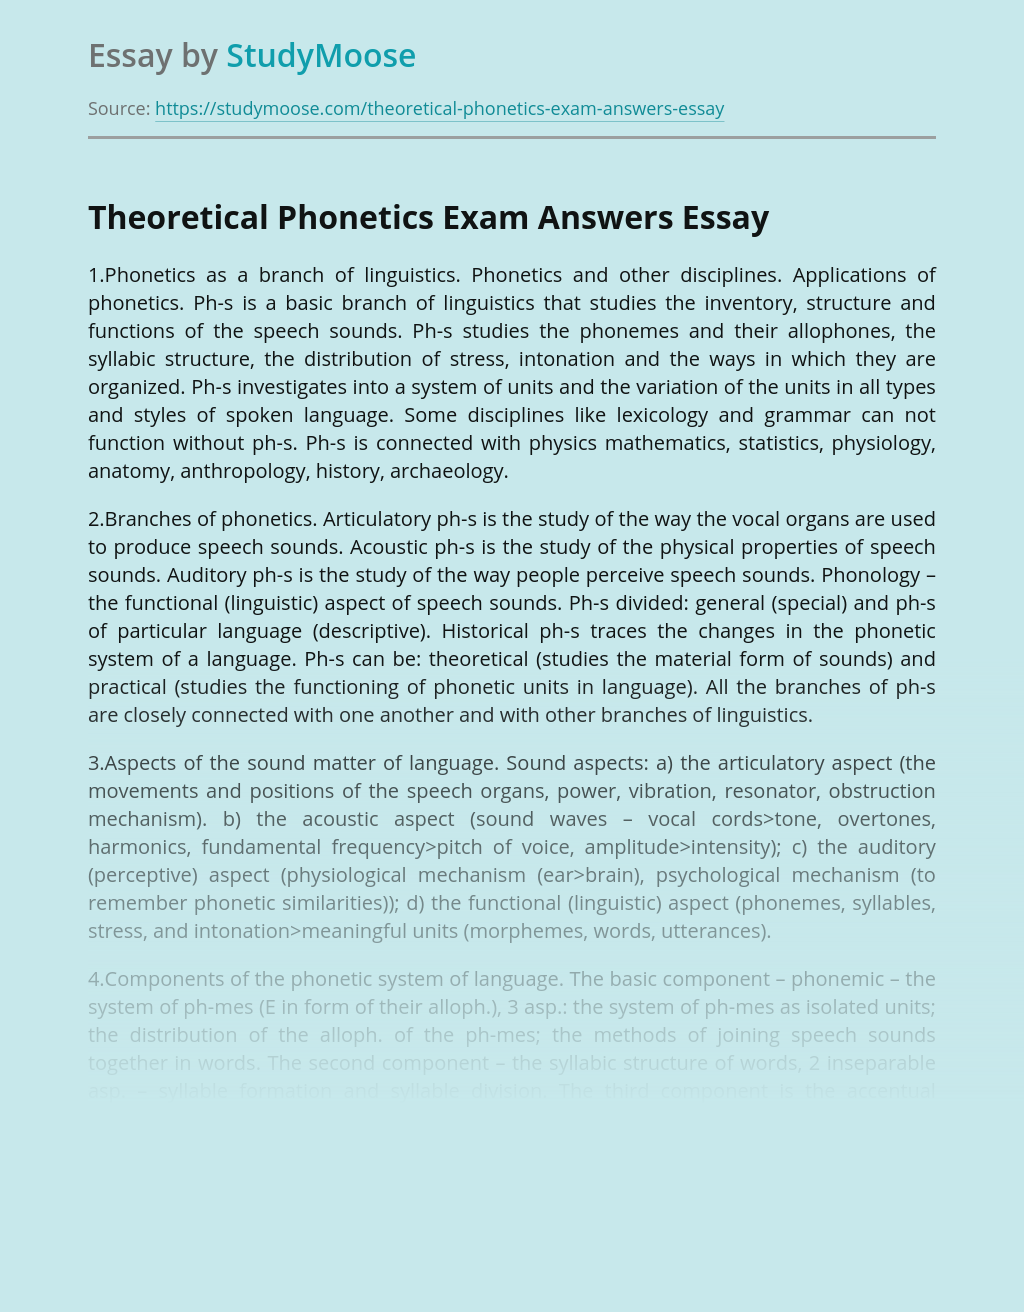 Theoretical Phonetics Exam Answers